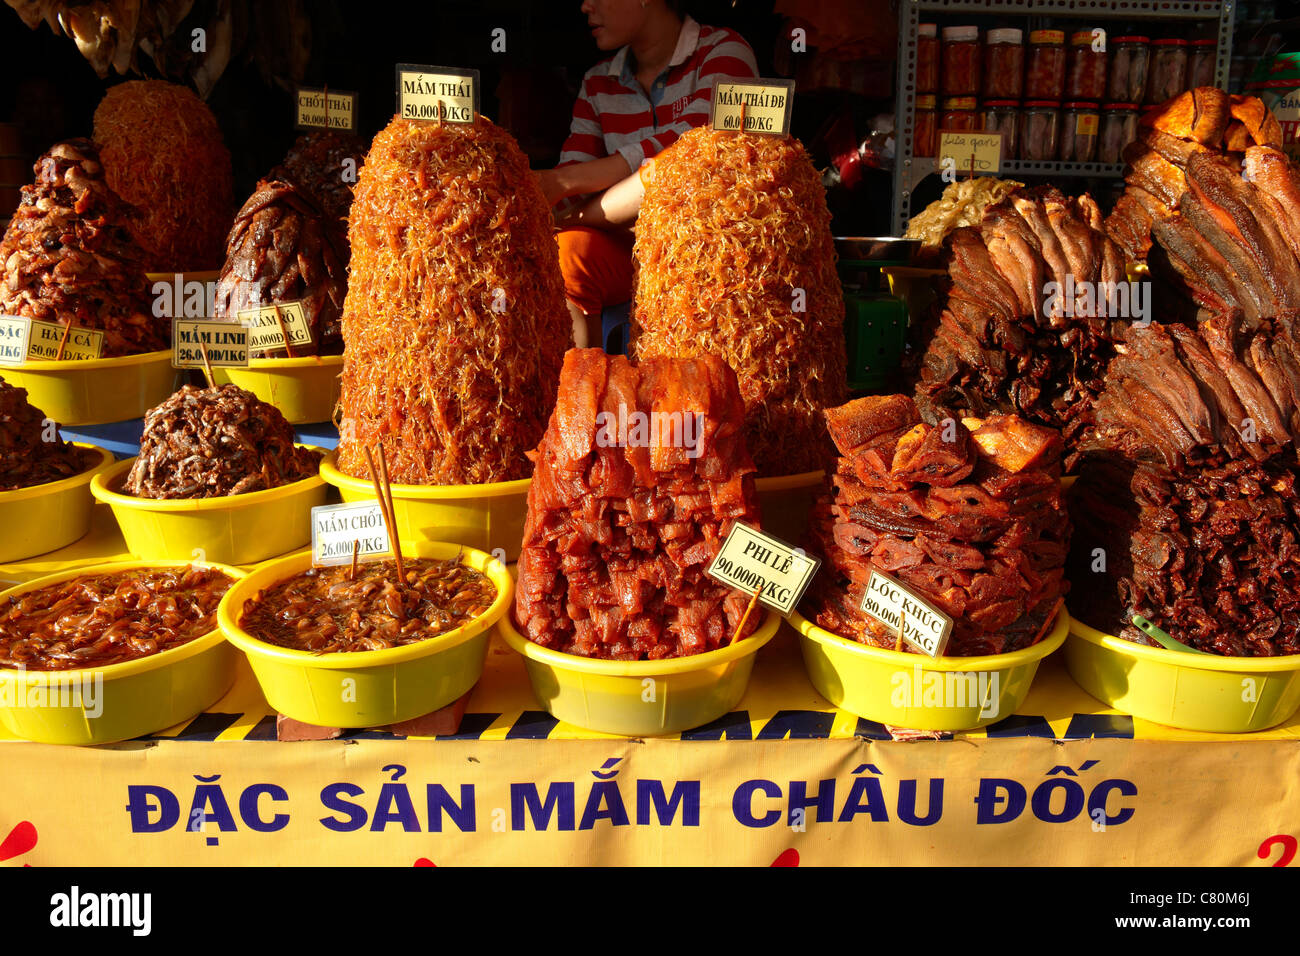 Vietnam, Mekong Delta Region, Chau Doc area, Sam Mountain Market - Stock Image